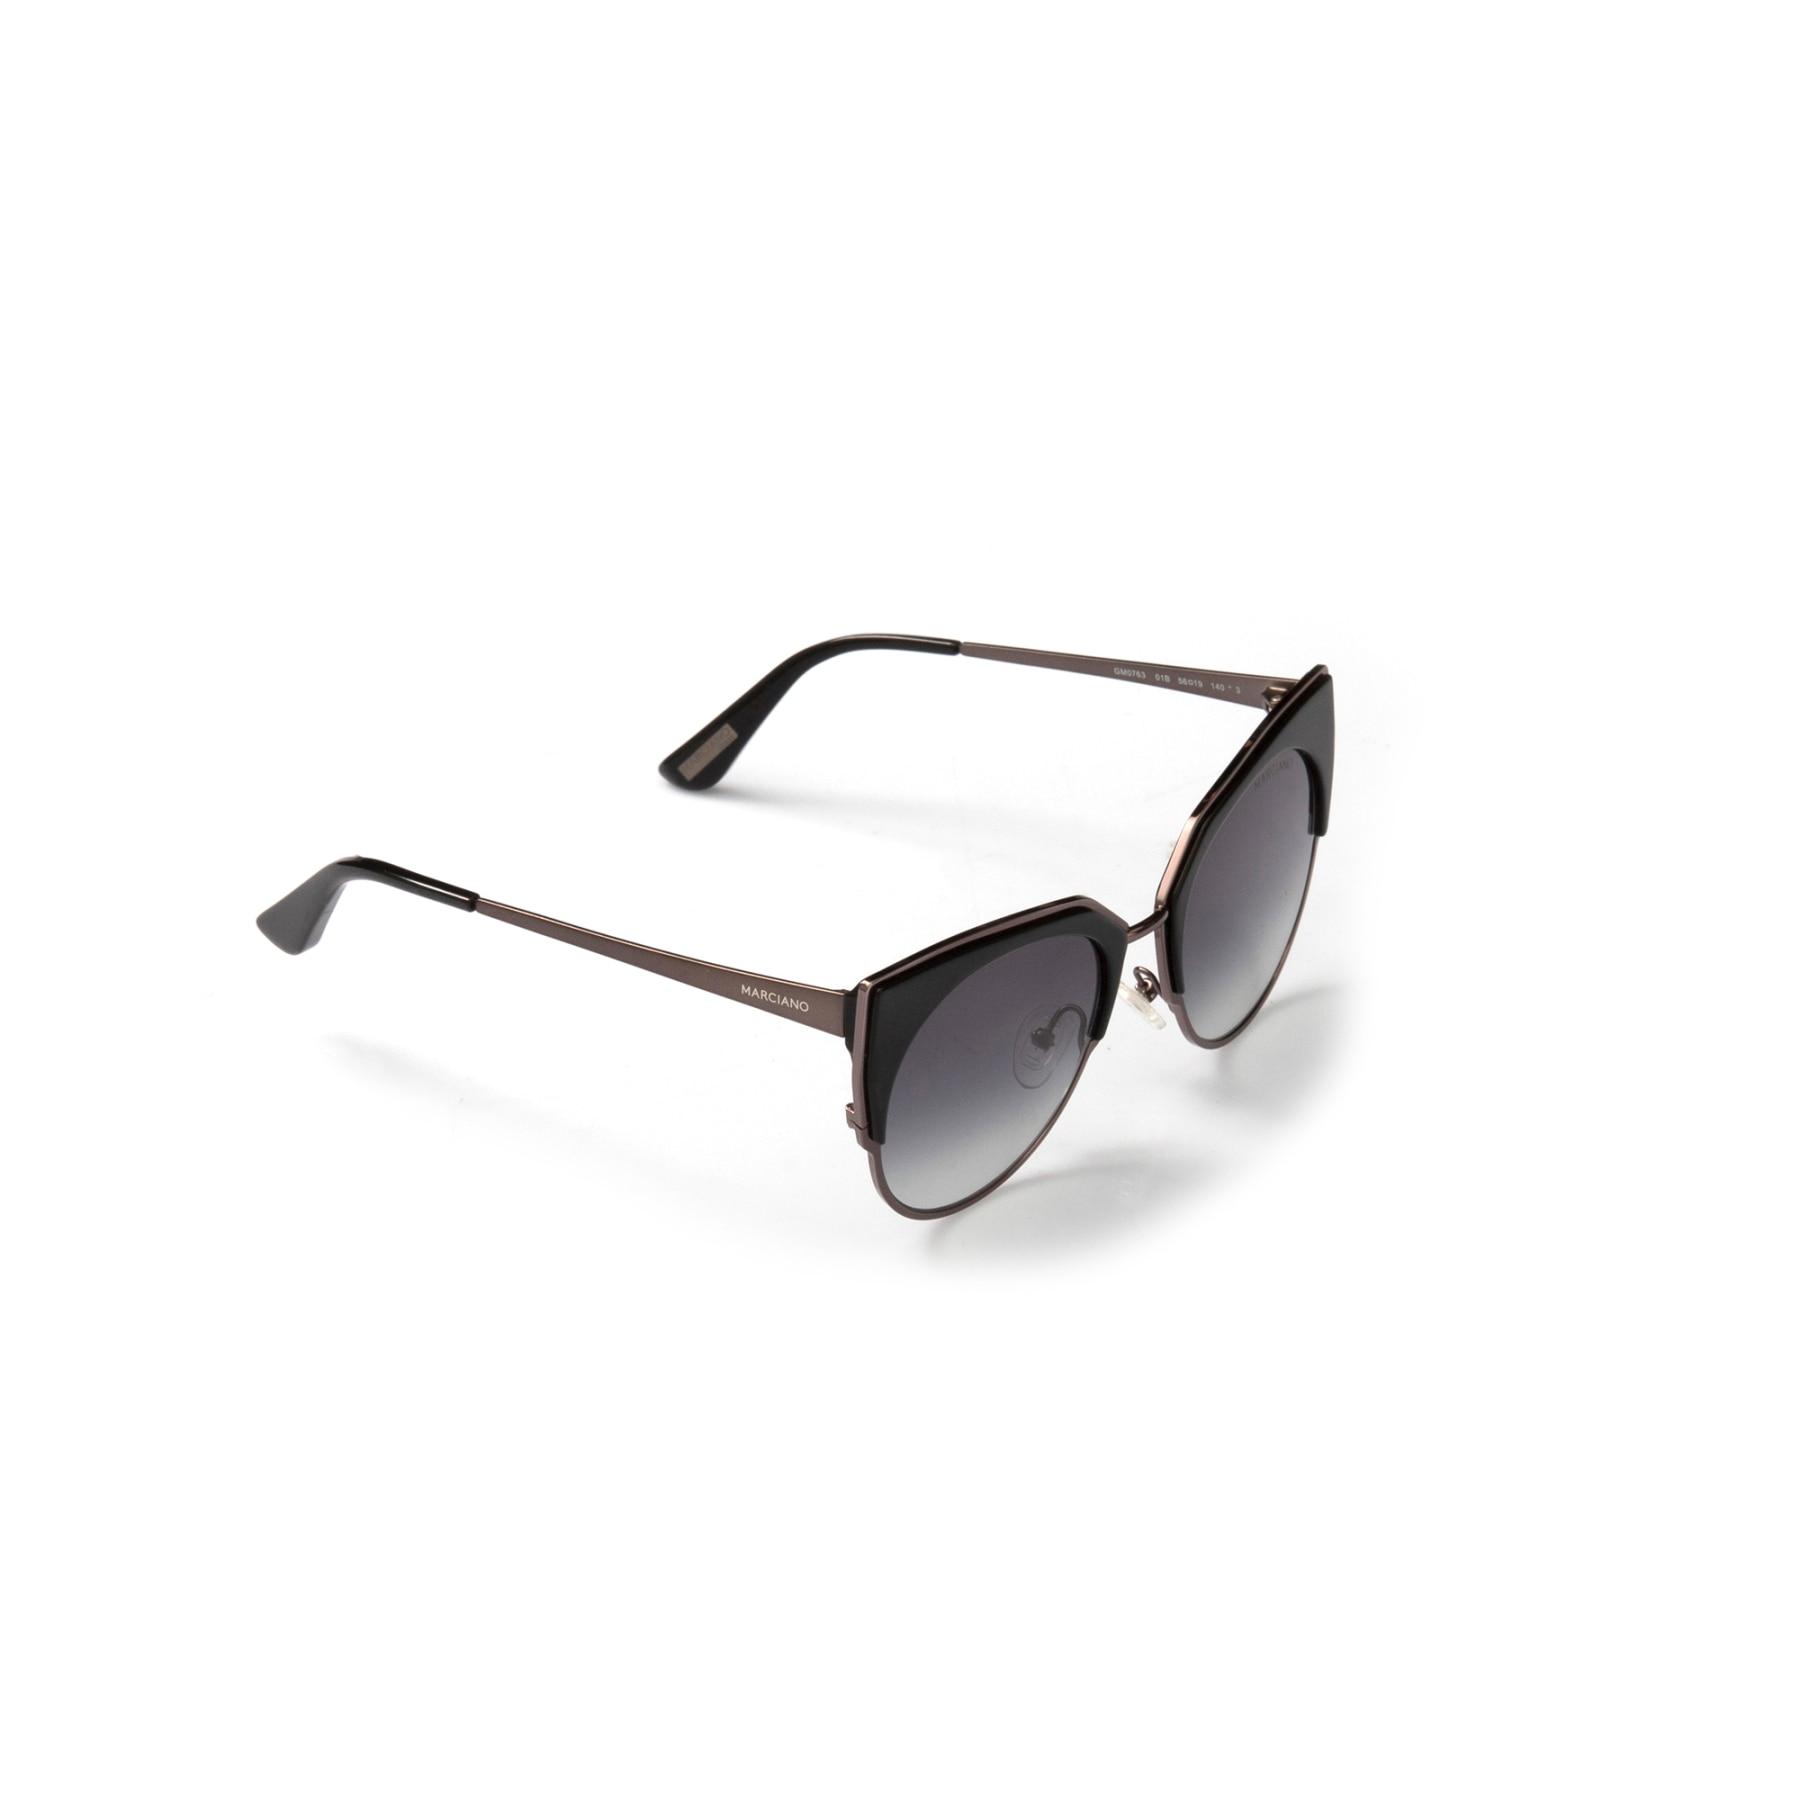 Women's sunglasses gm 0763 01b clubmaster black organic butterfly cat eye 56-19-140 guess by marcaino